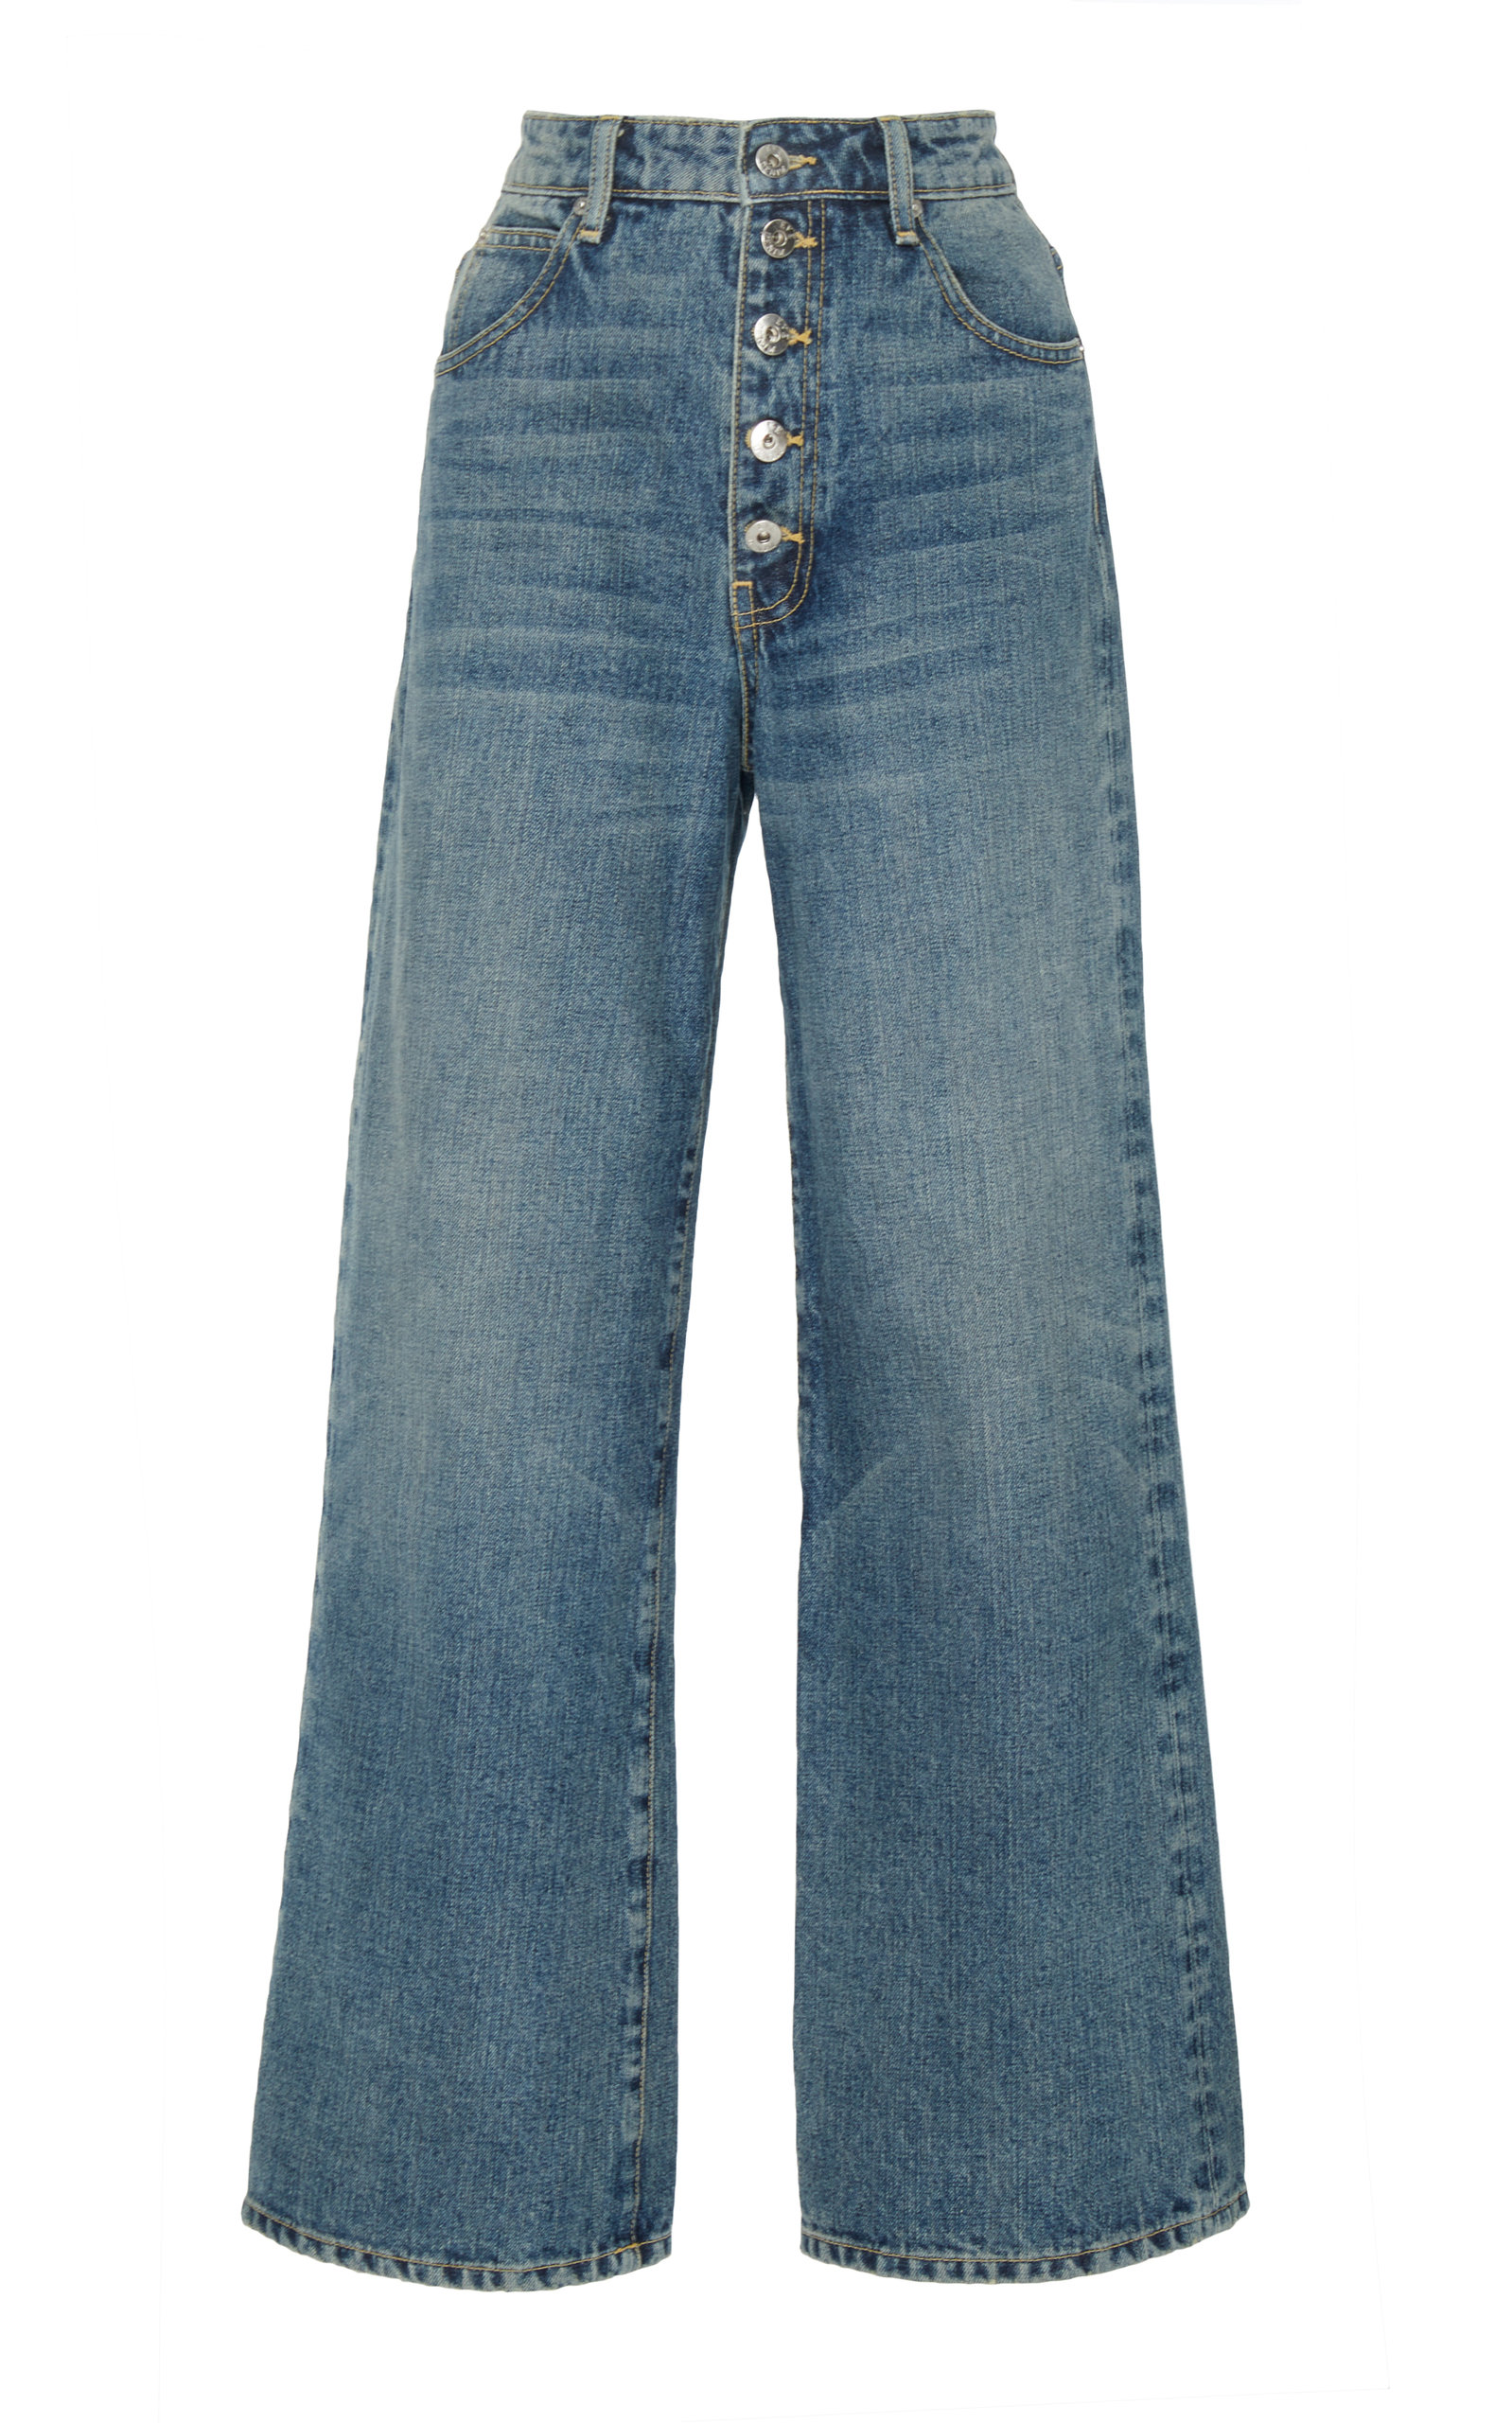 EVE DENIM Charlotte High-Rise Culotte Jeans in Soho Wash